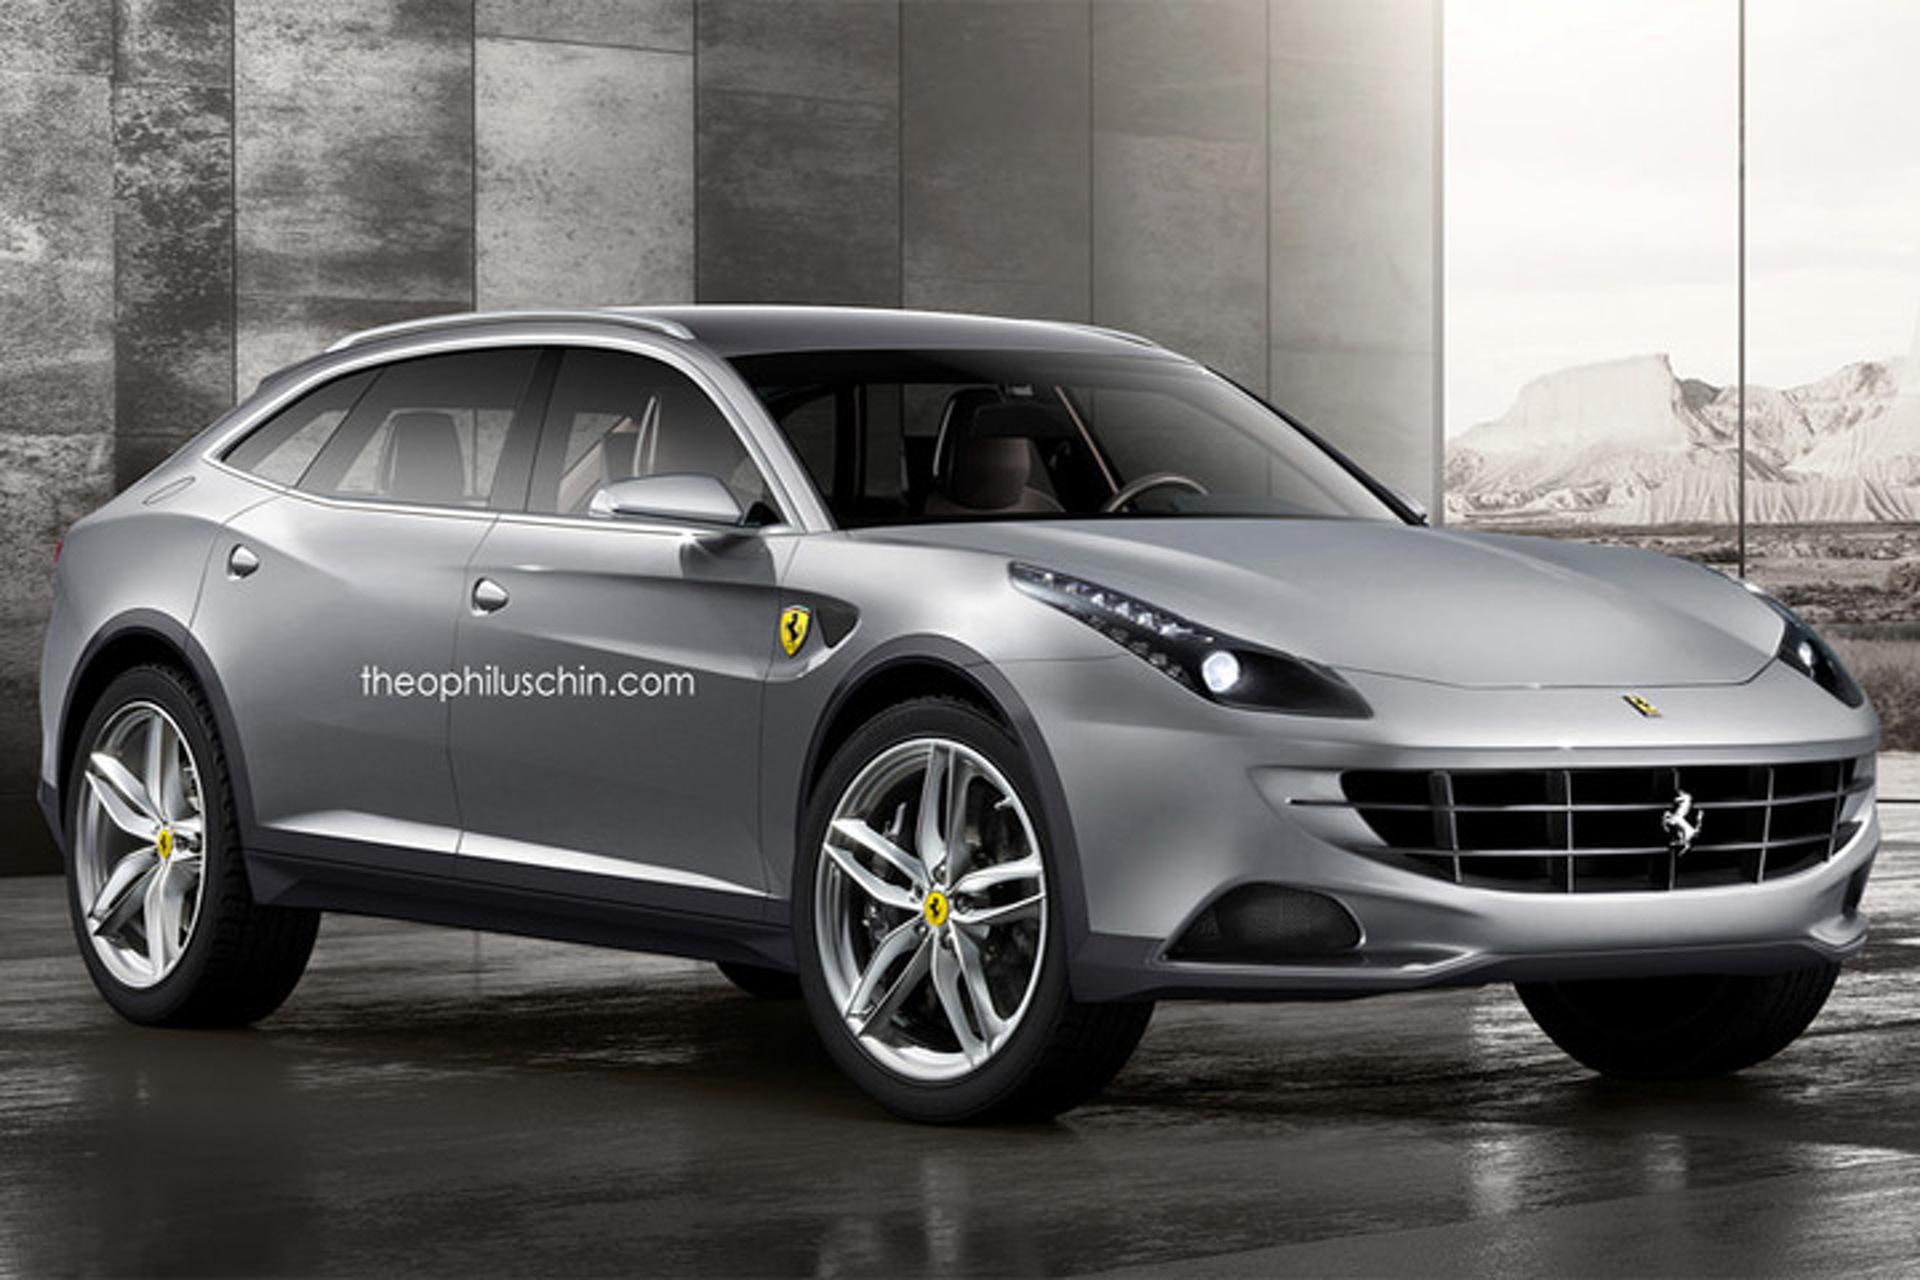 Ferrari SUV Production Confirmed, Still Several Years Away